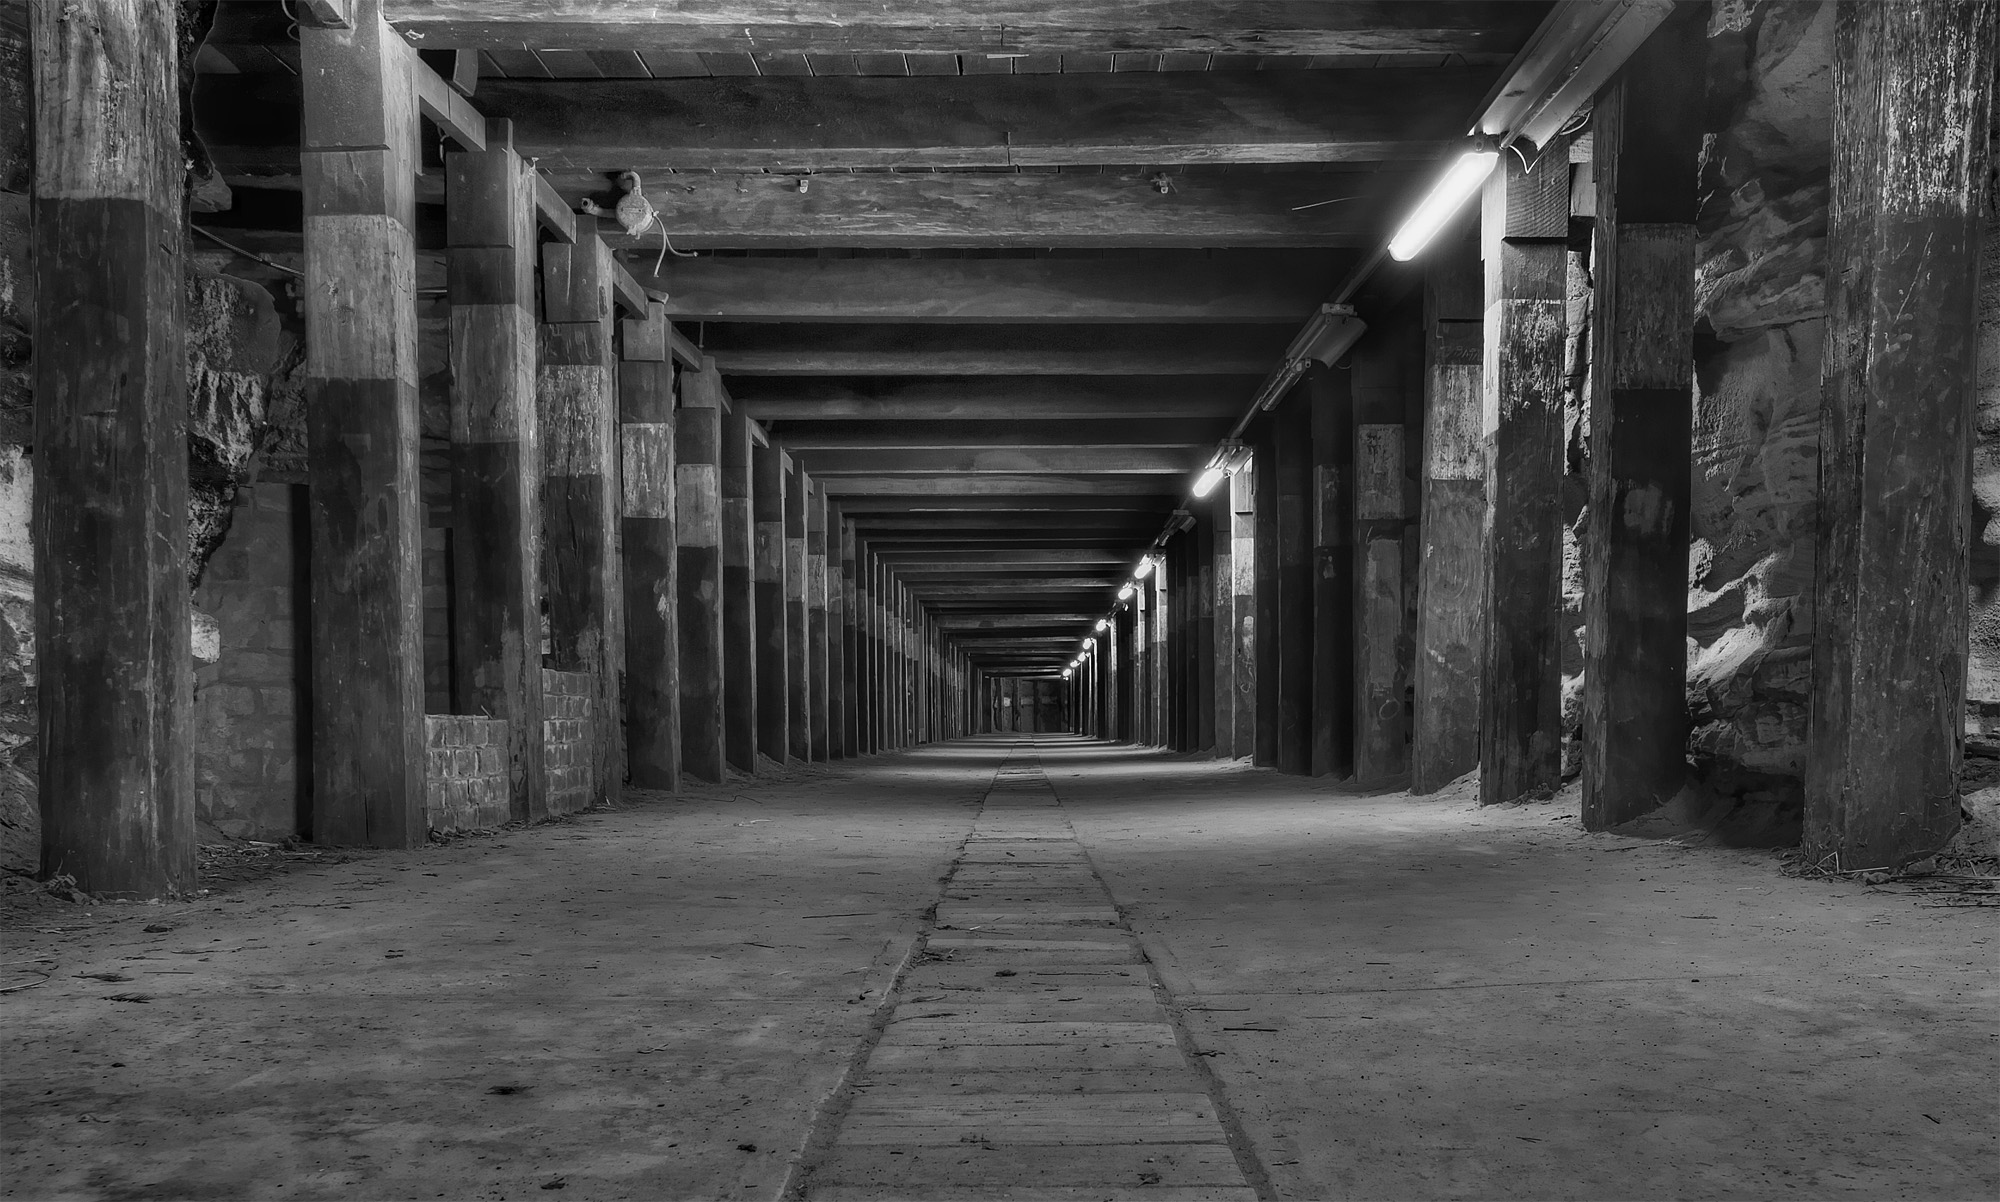 Dog Leg tunnel